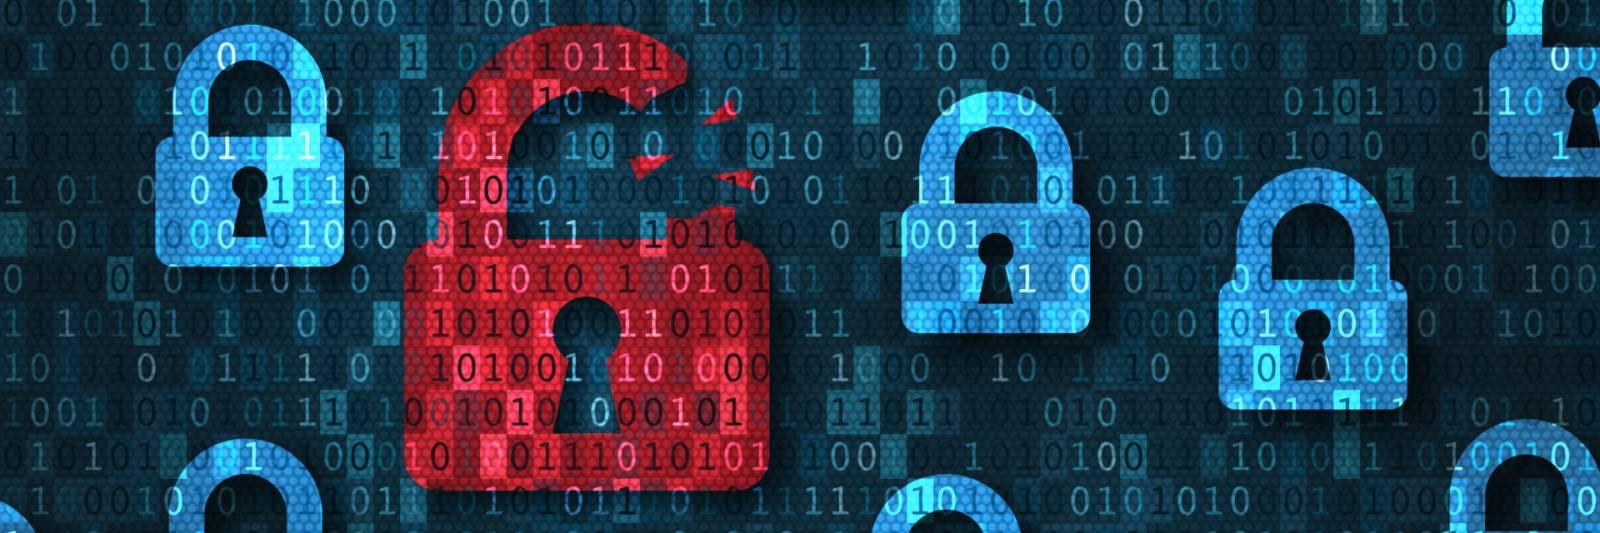 Weekly Threat Roundup: Vmware, Github, Facebook, And Mobileiron